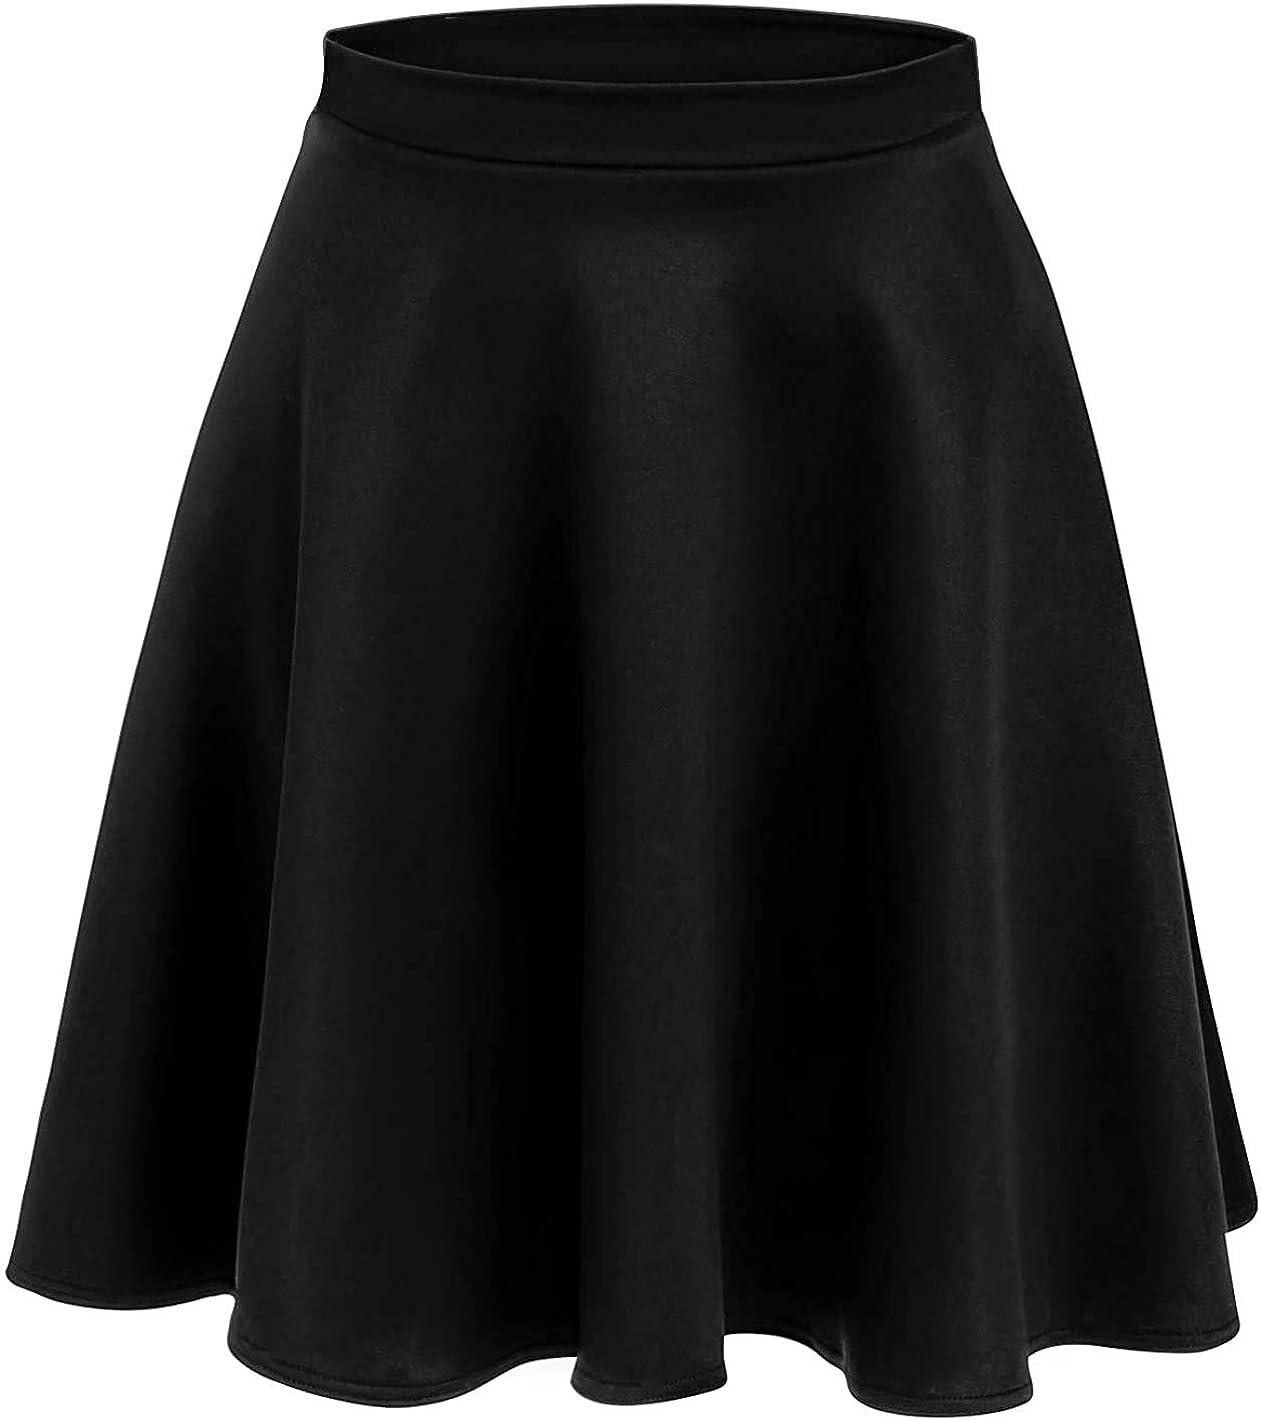 Loxdonz Women's Casual Stretchy Waist Flared Pleated Mini Skater Skirt